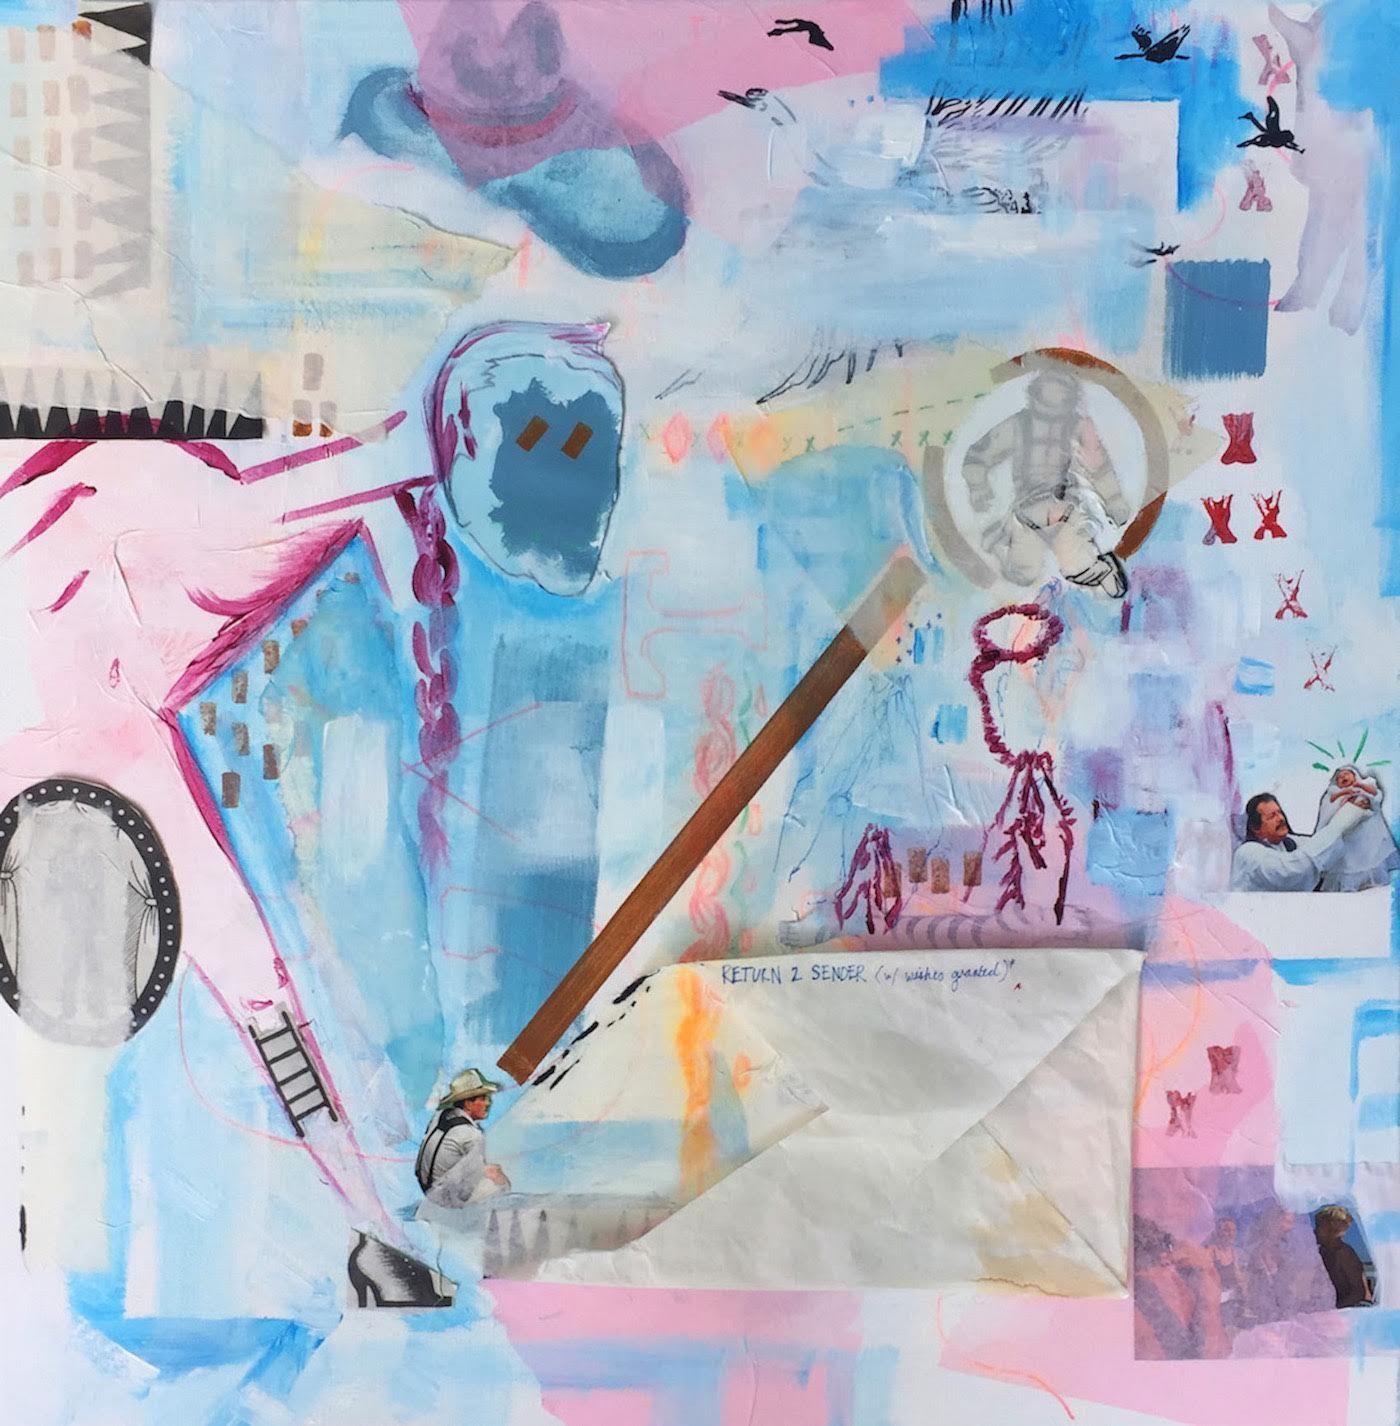 Image of artwork by Meredith Elder